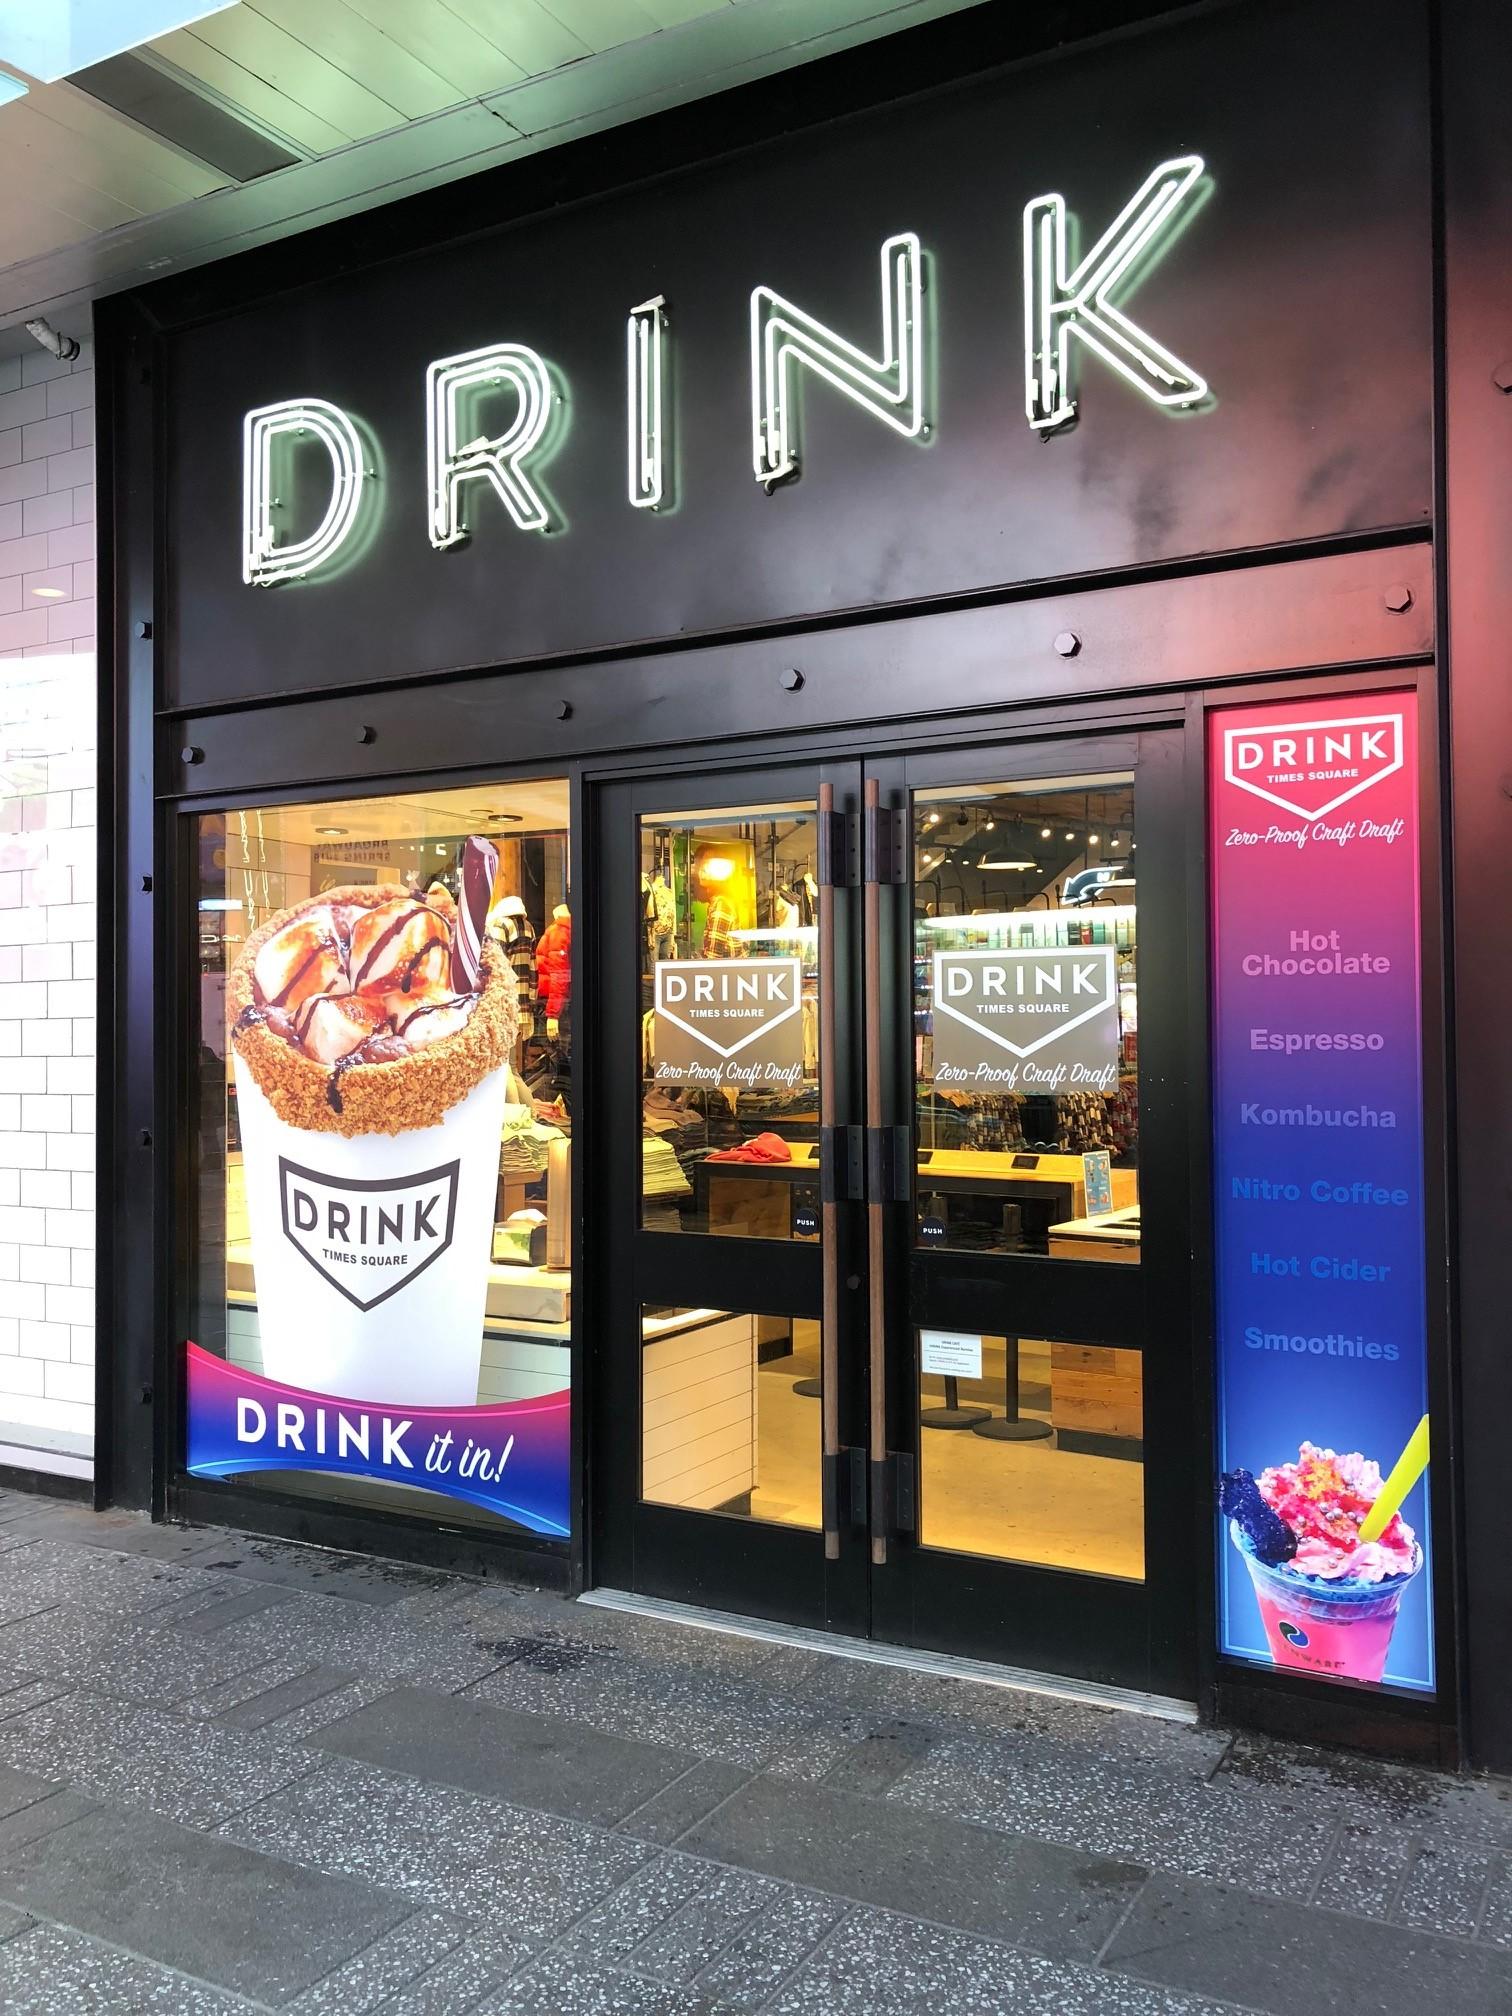 DRINK 3_11-17-17.jpg